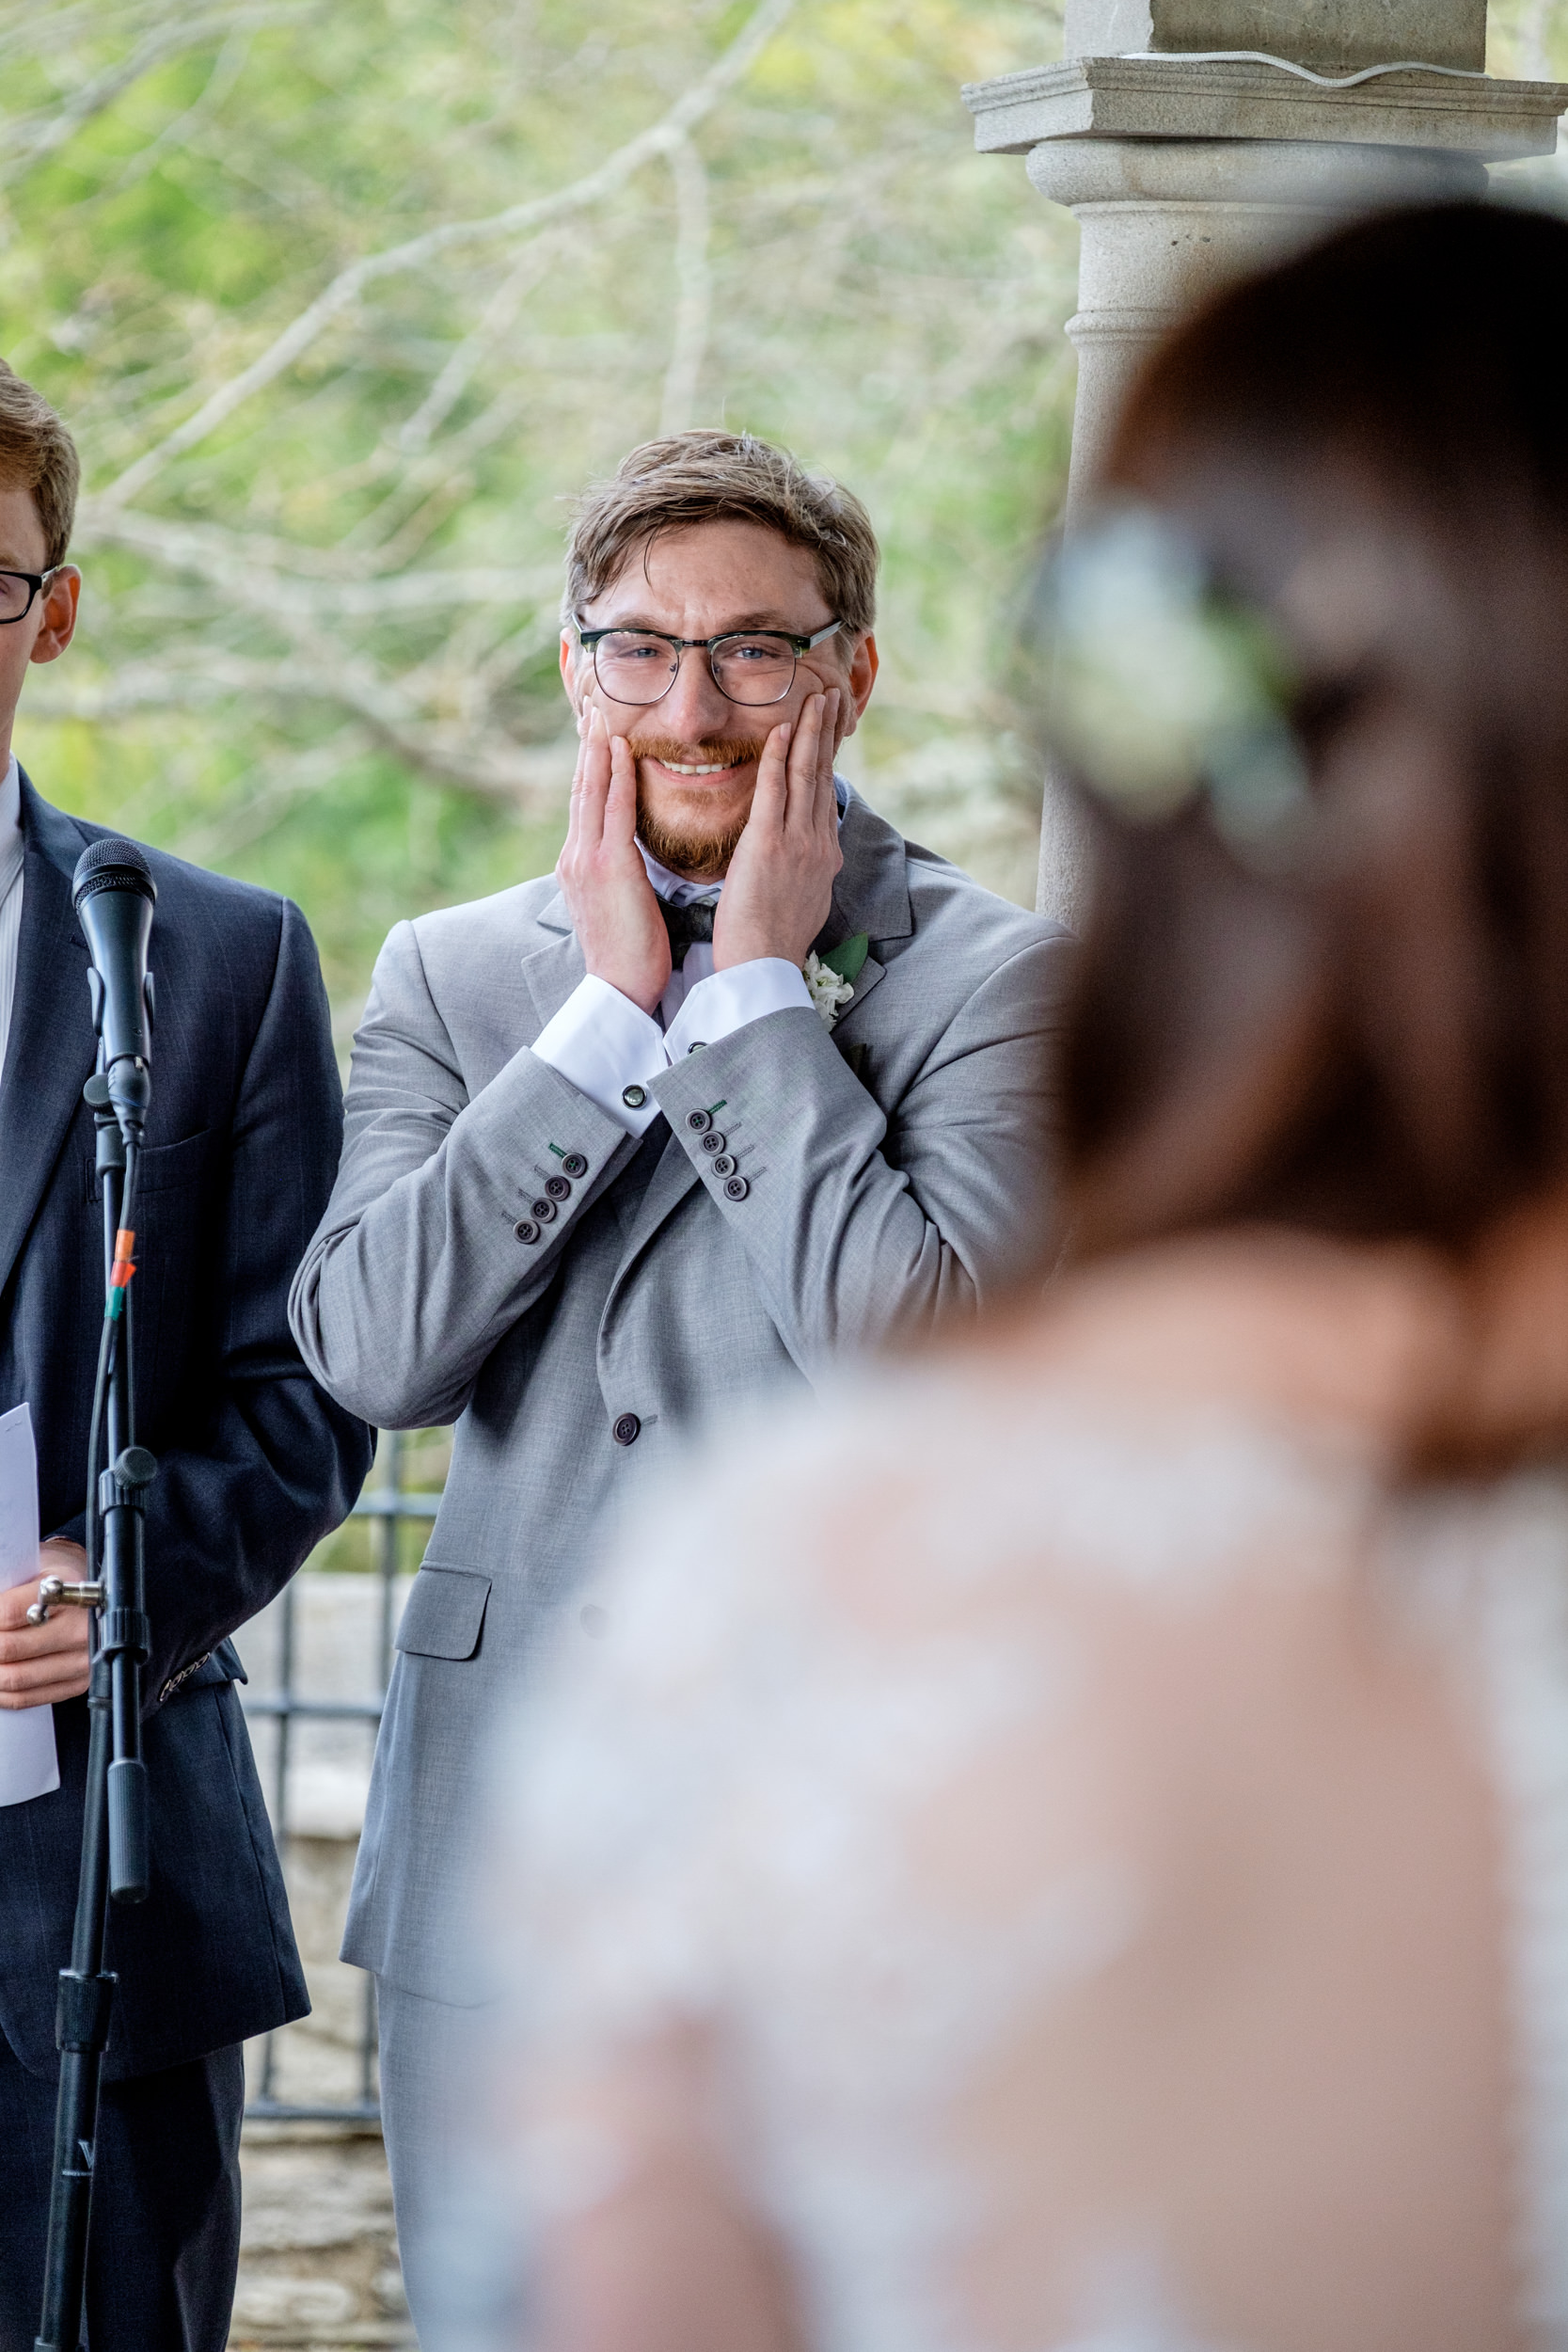 TheSmythCollective-Best-Cincinnati-Wedding-Photographer-007.jpg